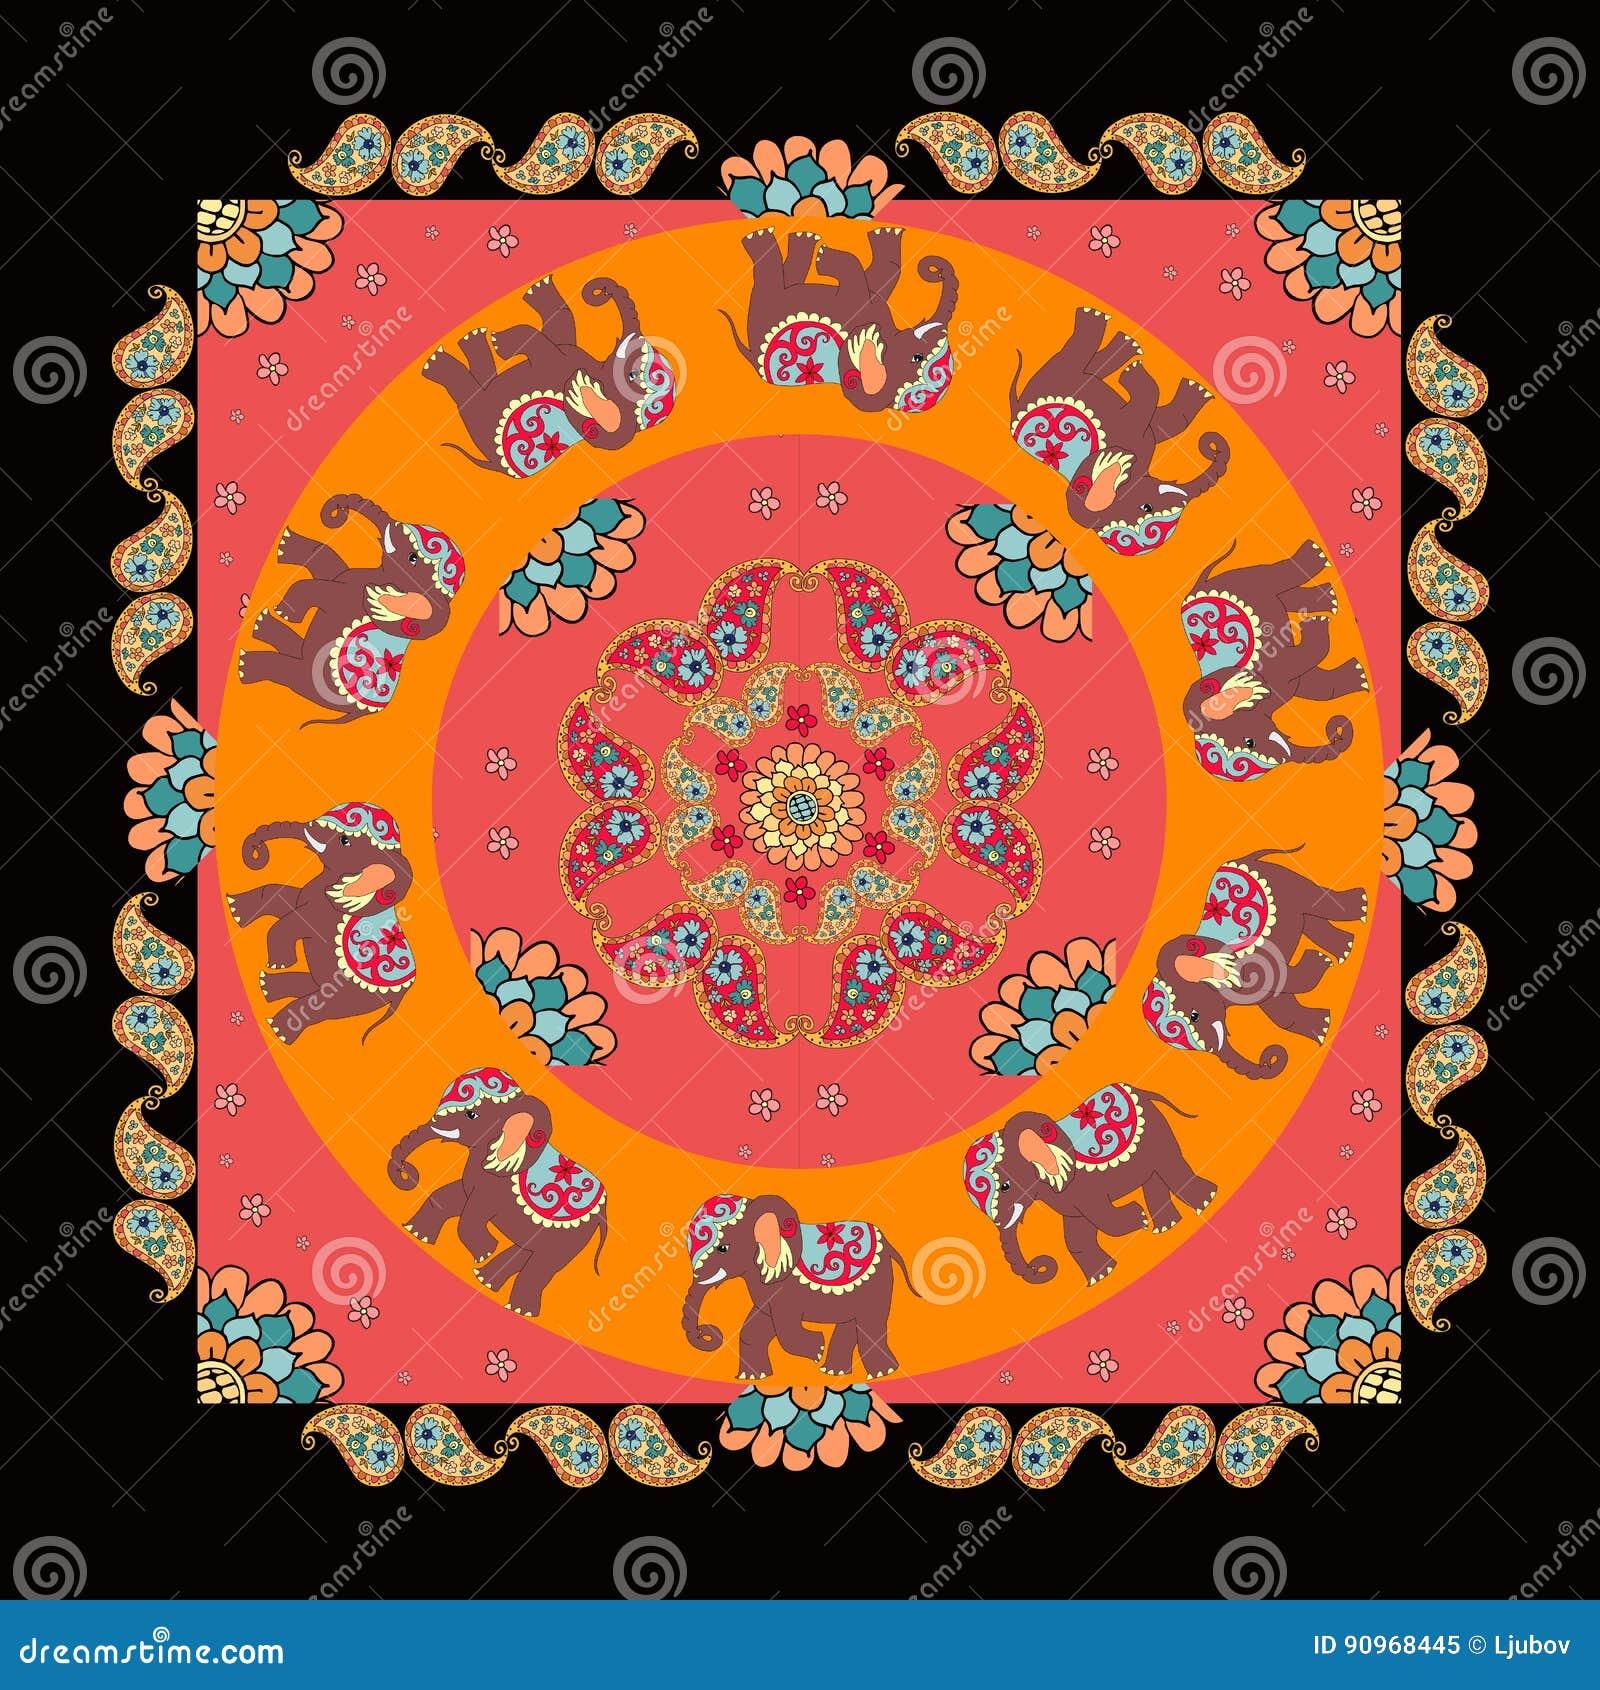 Ethnic Bandana Print With Beautiful Flowers Paisley And Elephants Summer Kerchief Square Pattern Design Style For On Fabric Mandala